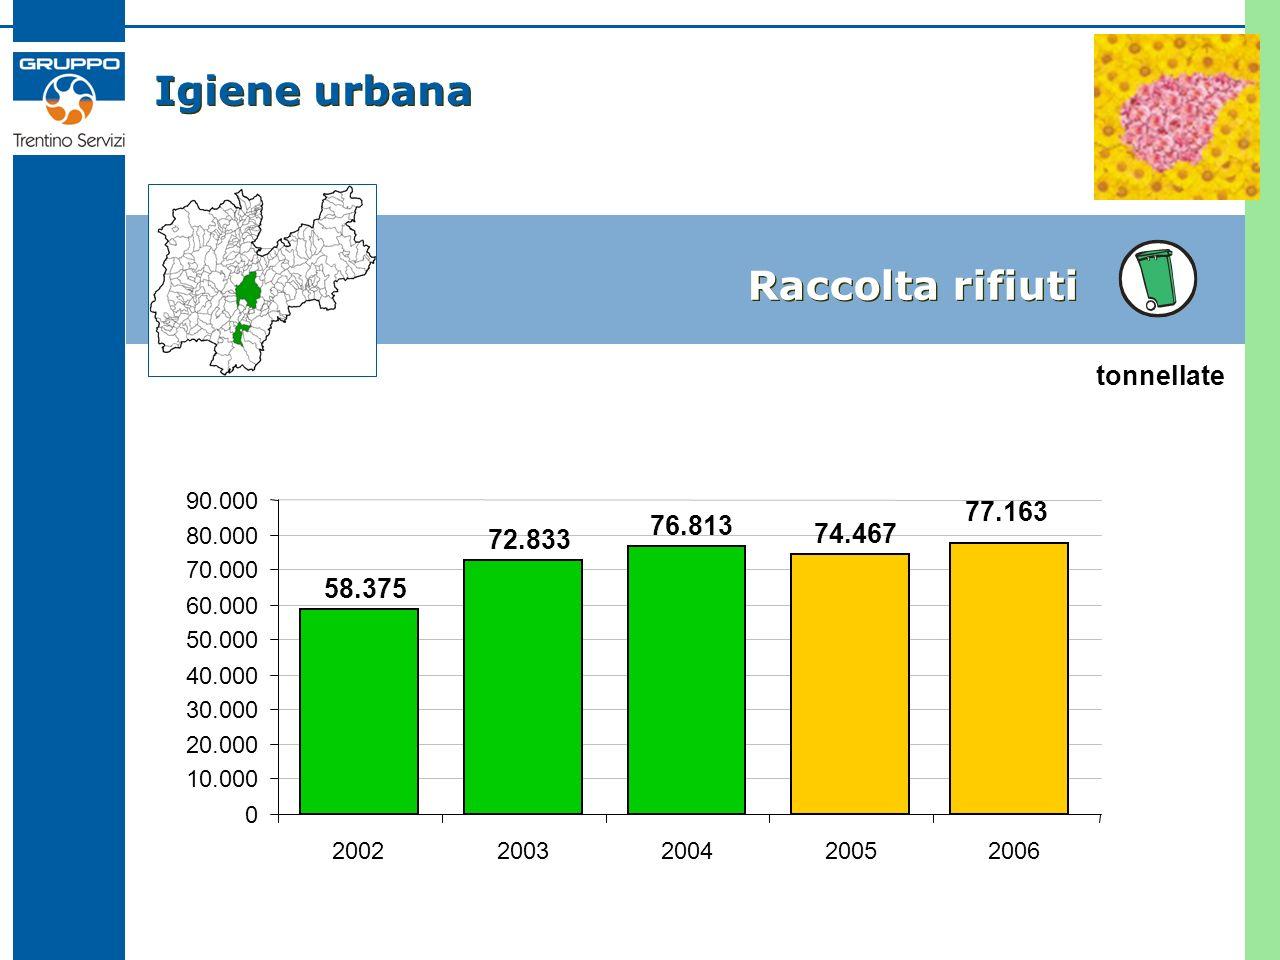 Igiene urbana Raccolta rifiuti 58.375 72.833 76.813 74.467 0 10.000 20.000 30.000 40.000 50.000 60.000 70.000 80.000 90.000 2002200320042005 tonnellat